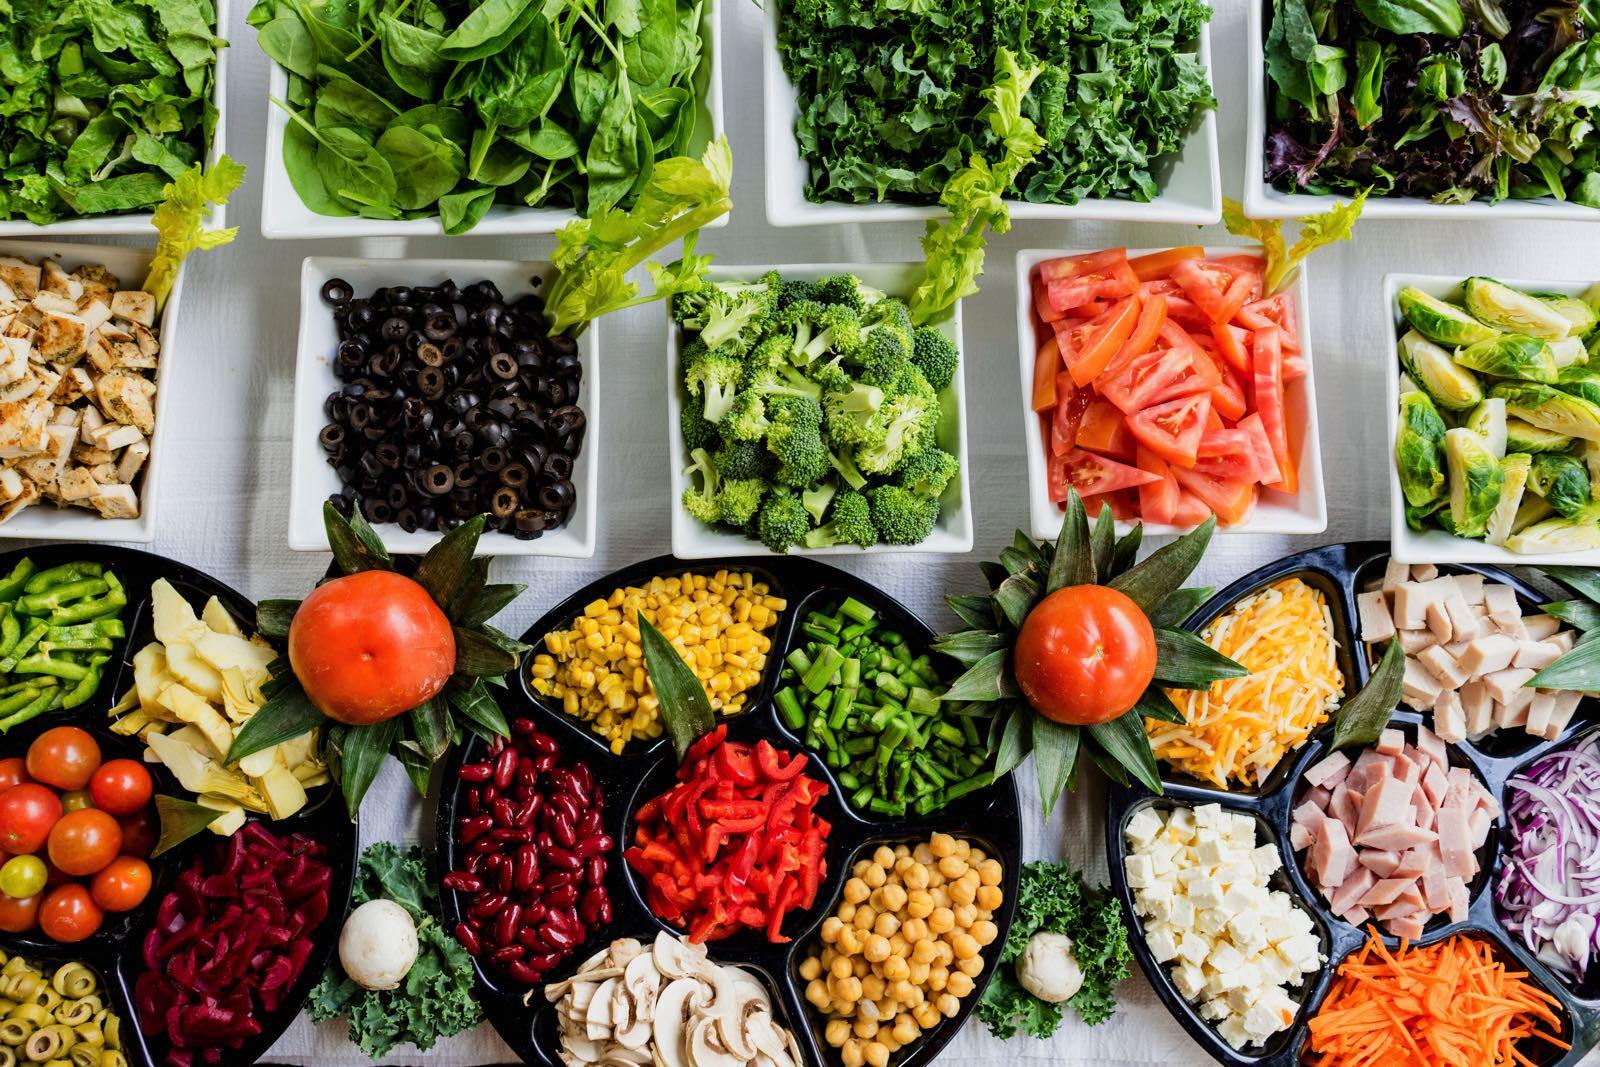 Bowls of salad